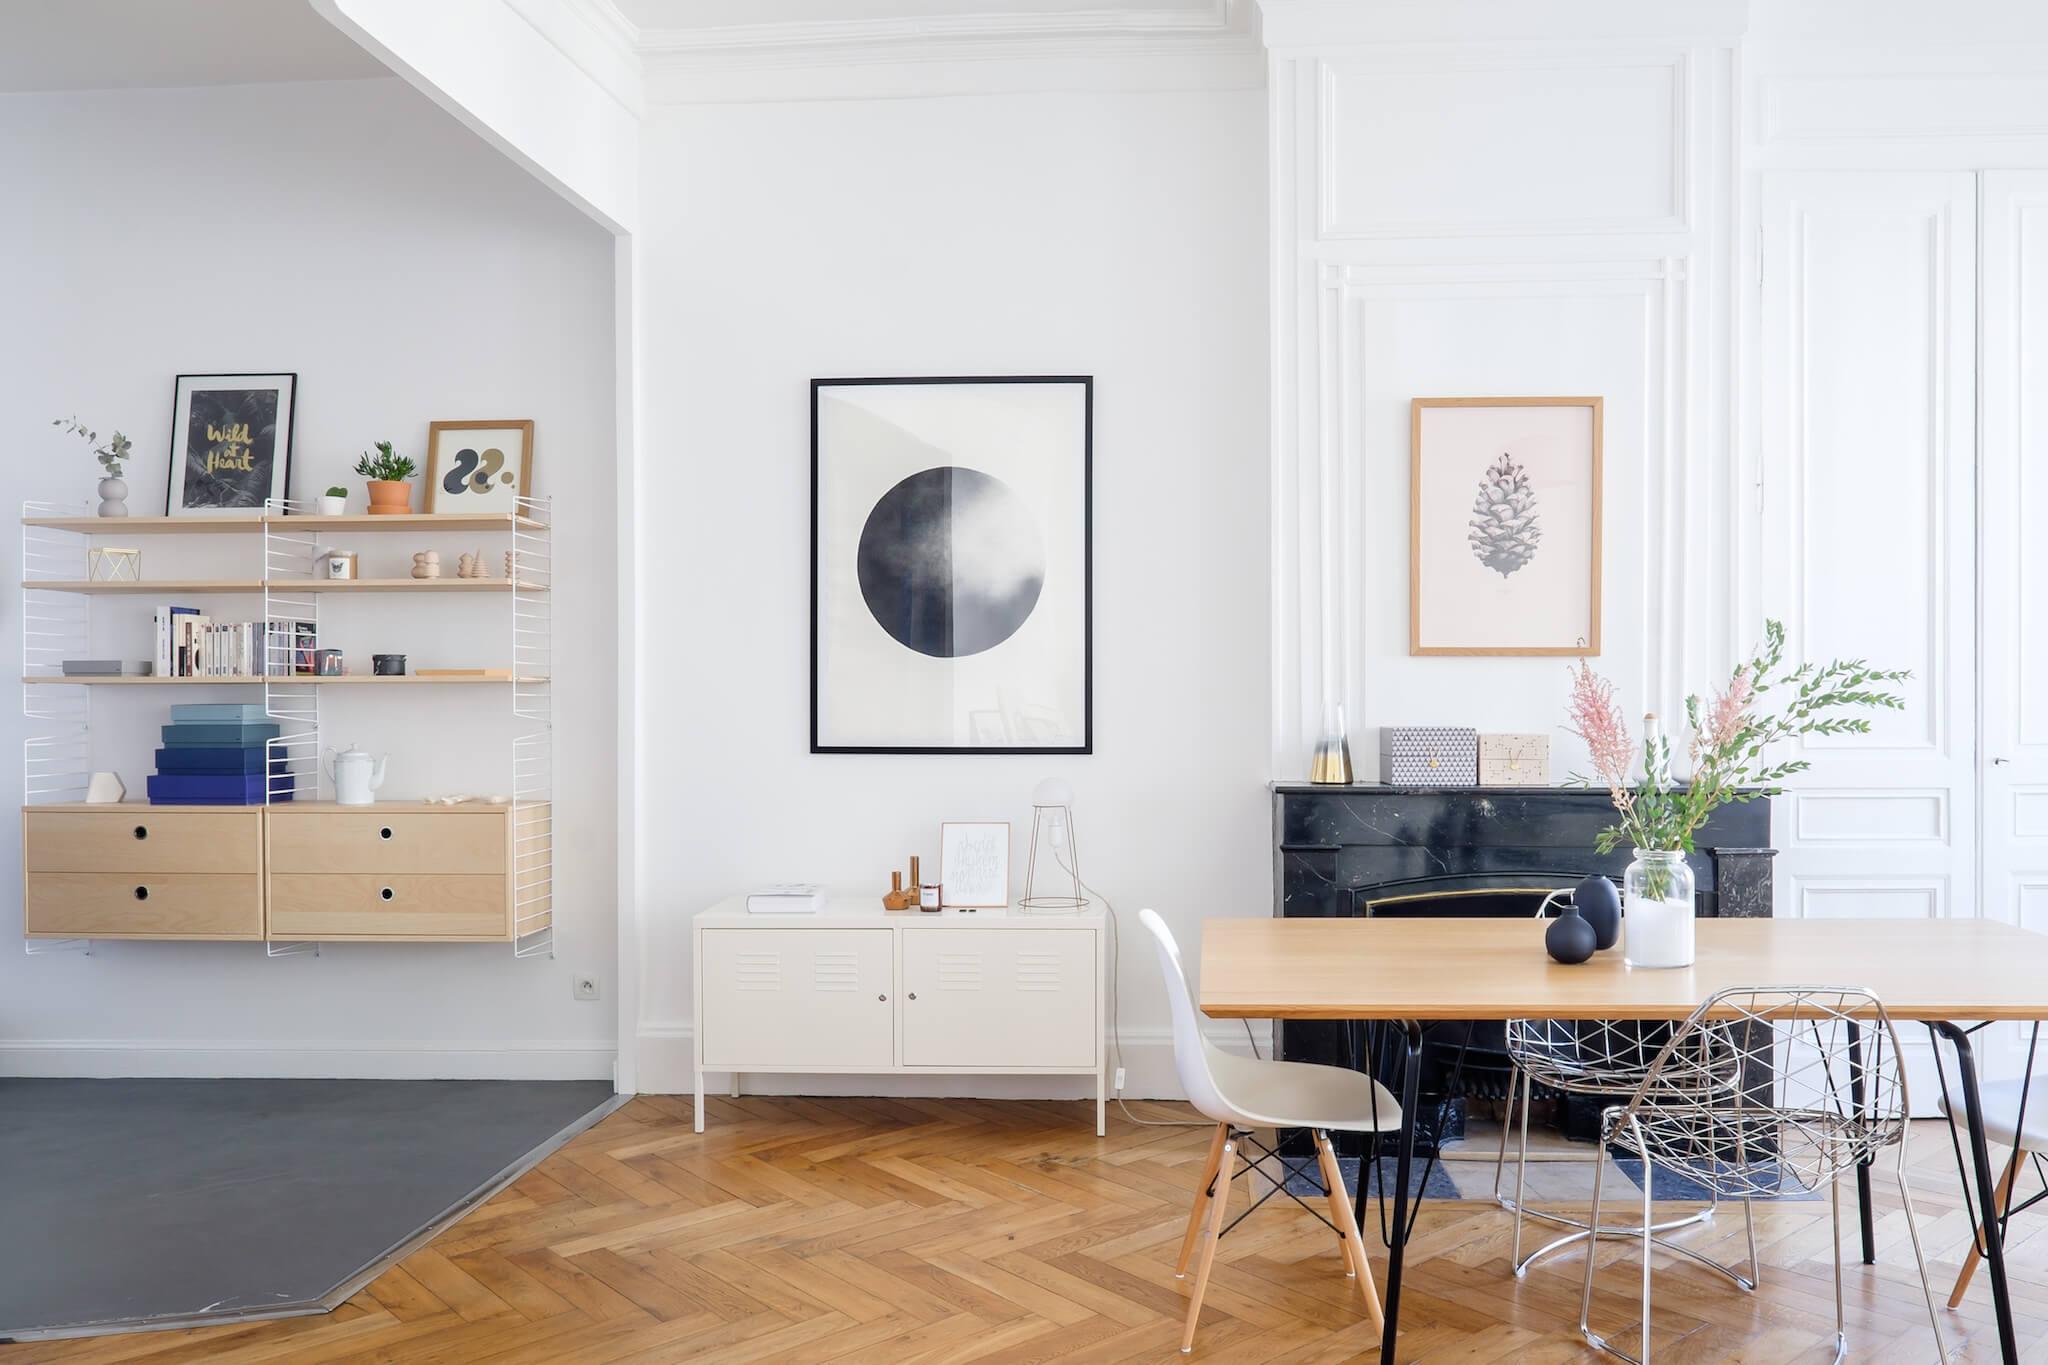 bumper-vendu-appartement-maison-immobilier7.jpg